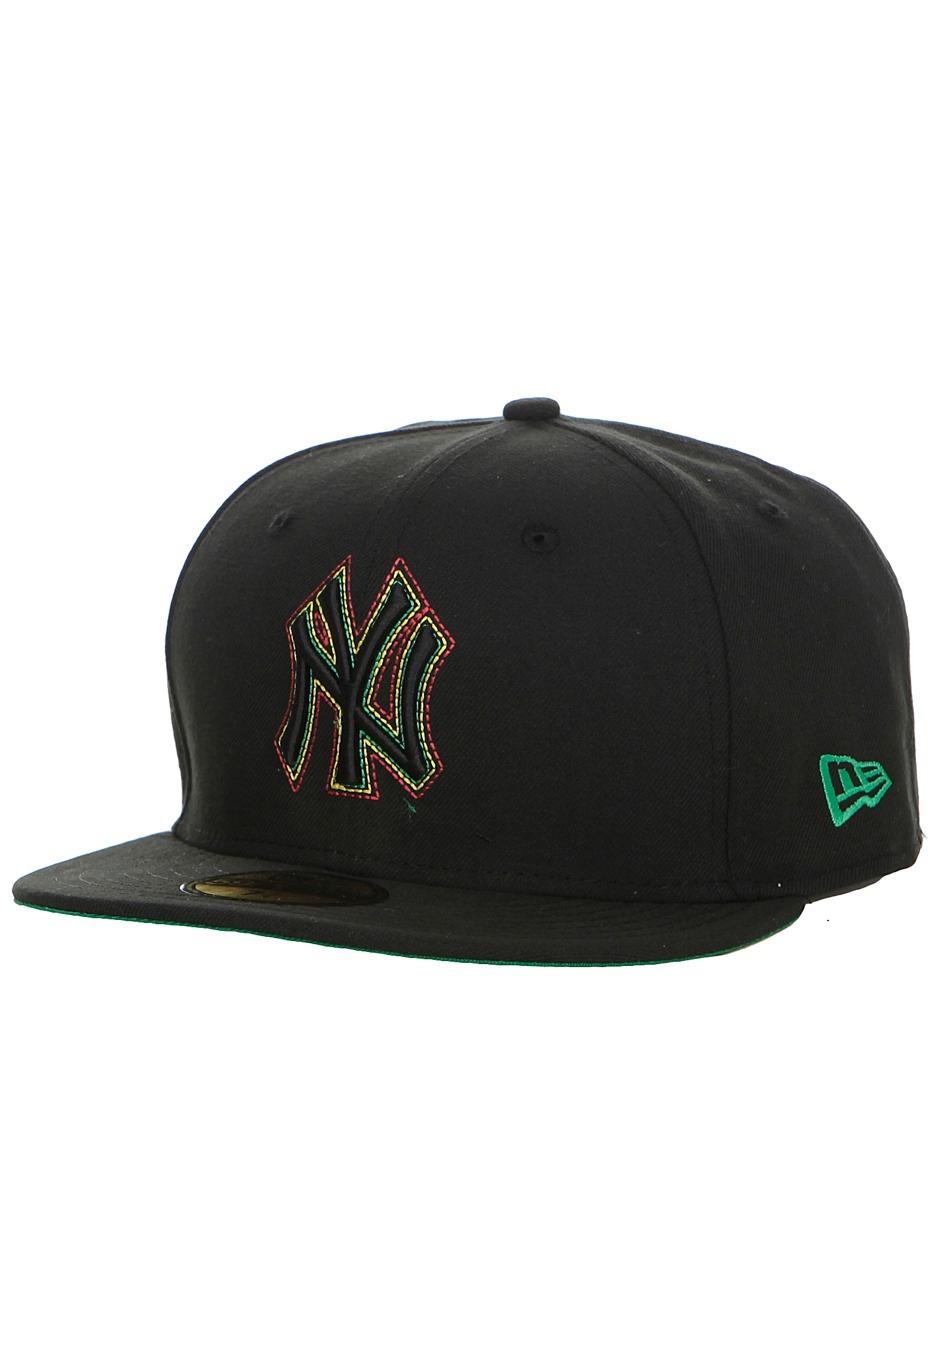 New Era - Chain Pop New York Yankees Black Kelly Yellow Scarlet - Cap -  Impericon.com UK c3ad15af26e